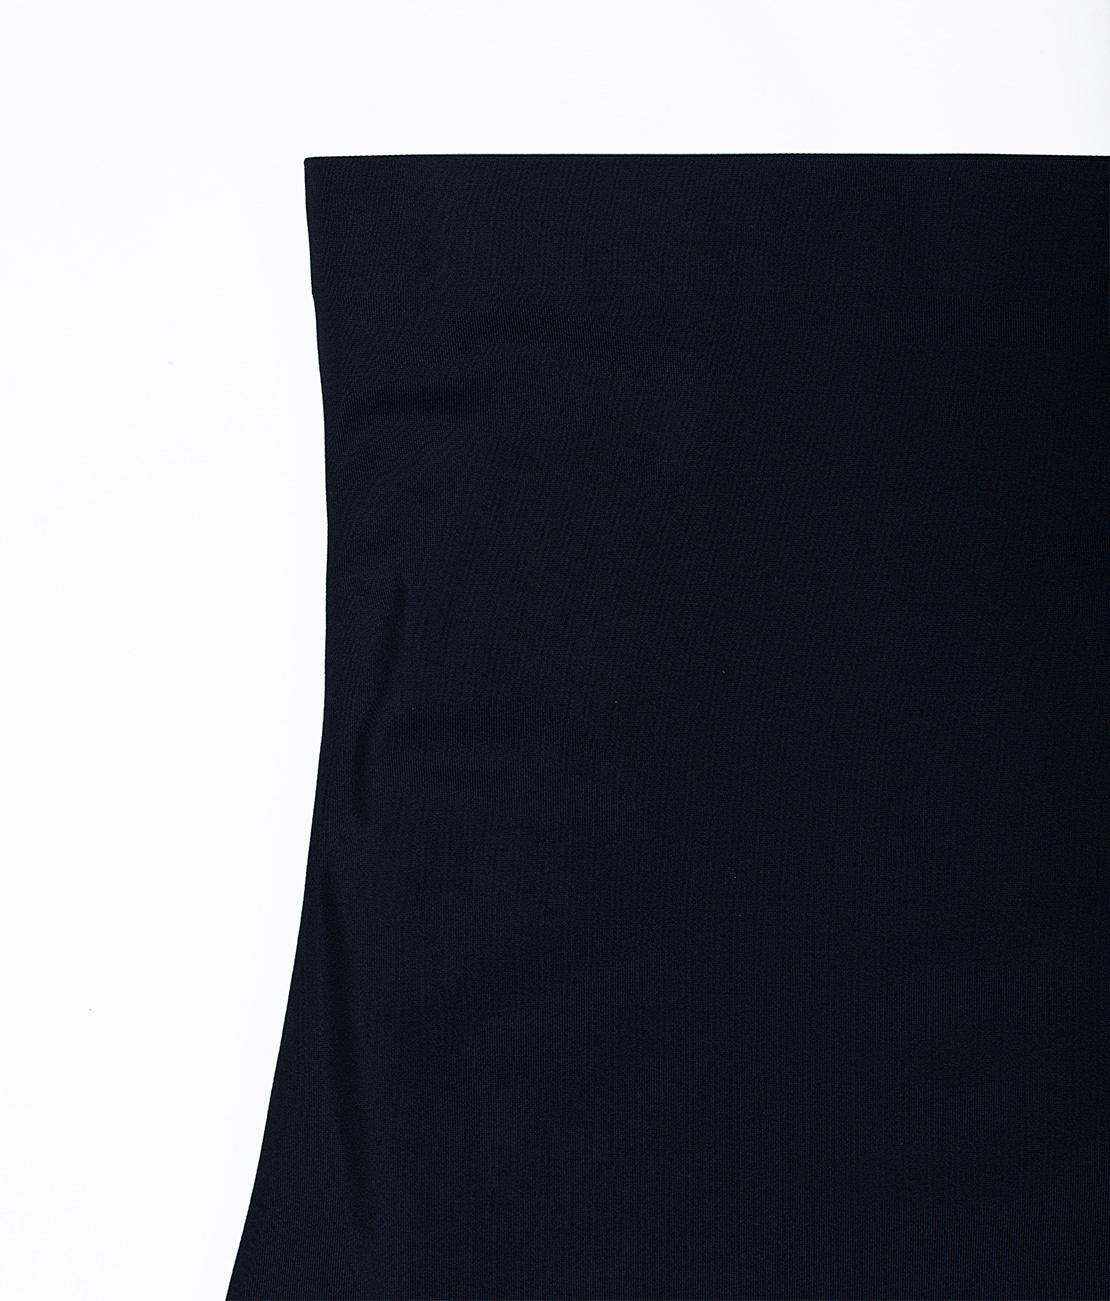 Fond de Robe Noir Packshot Detail 2